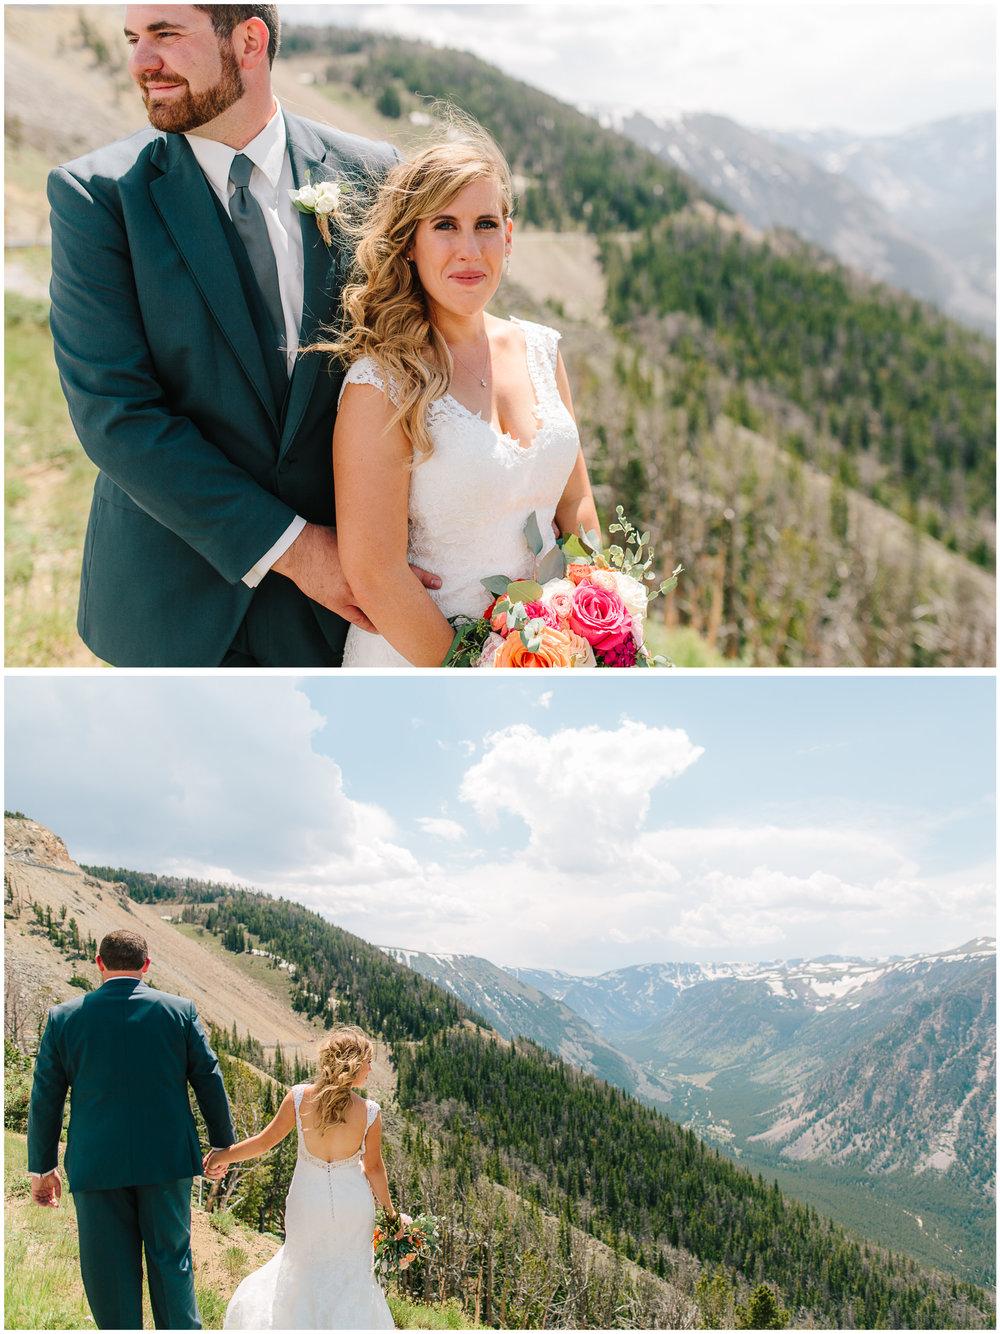 redlodge_montana_wedding_33.jpg